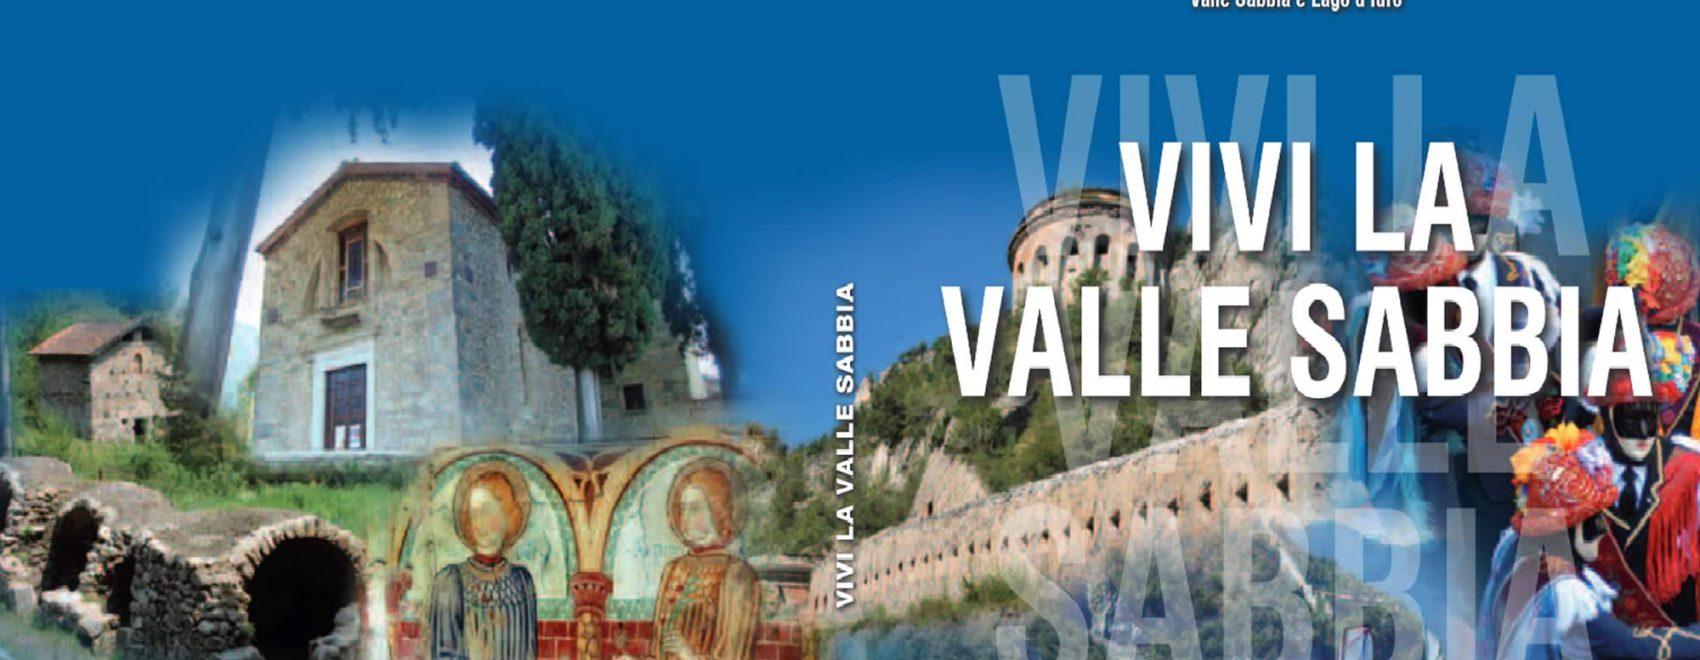 copertina-vivilavalsabbia